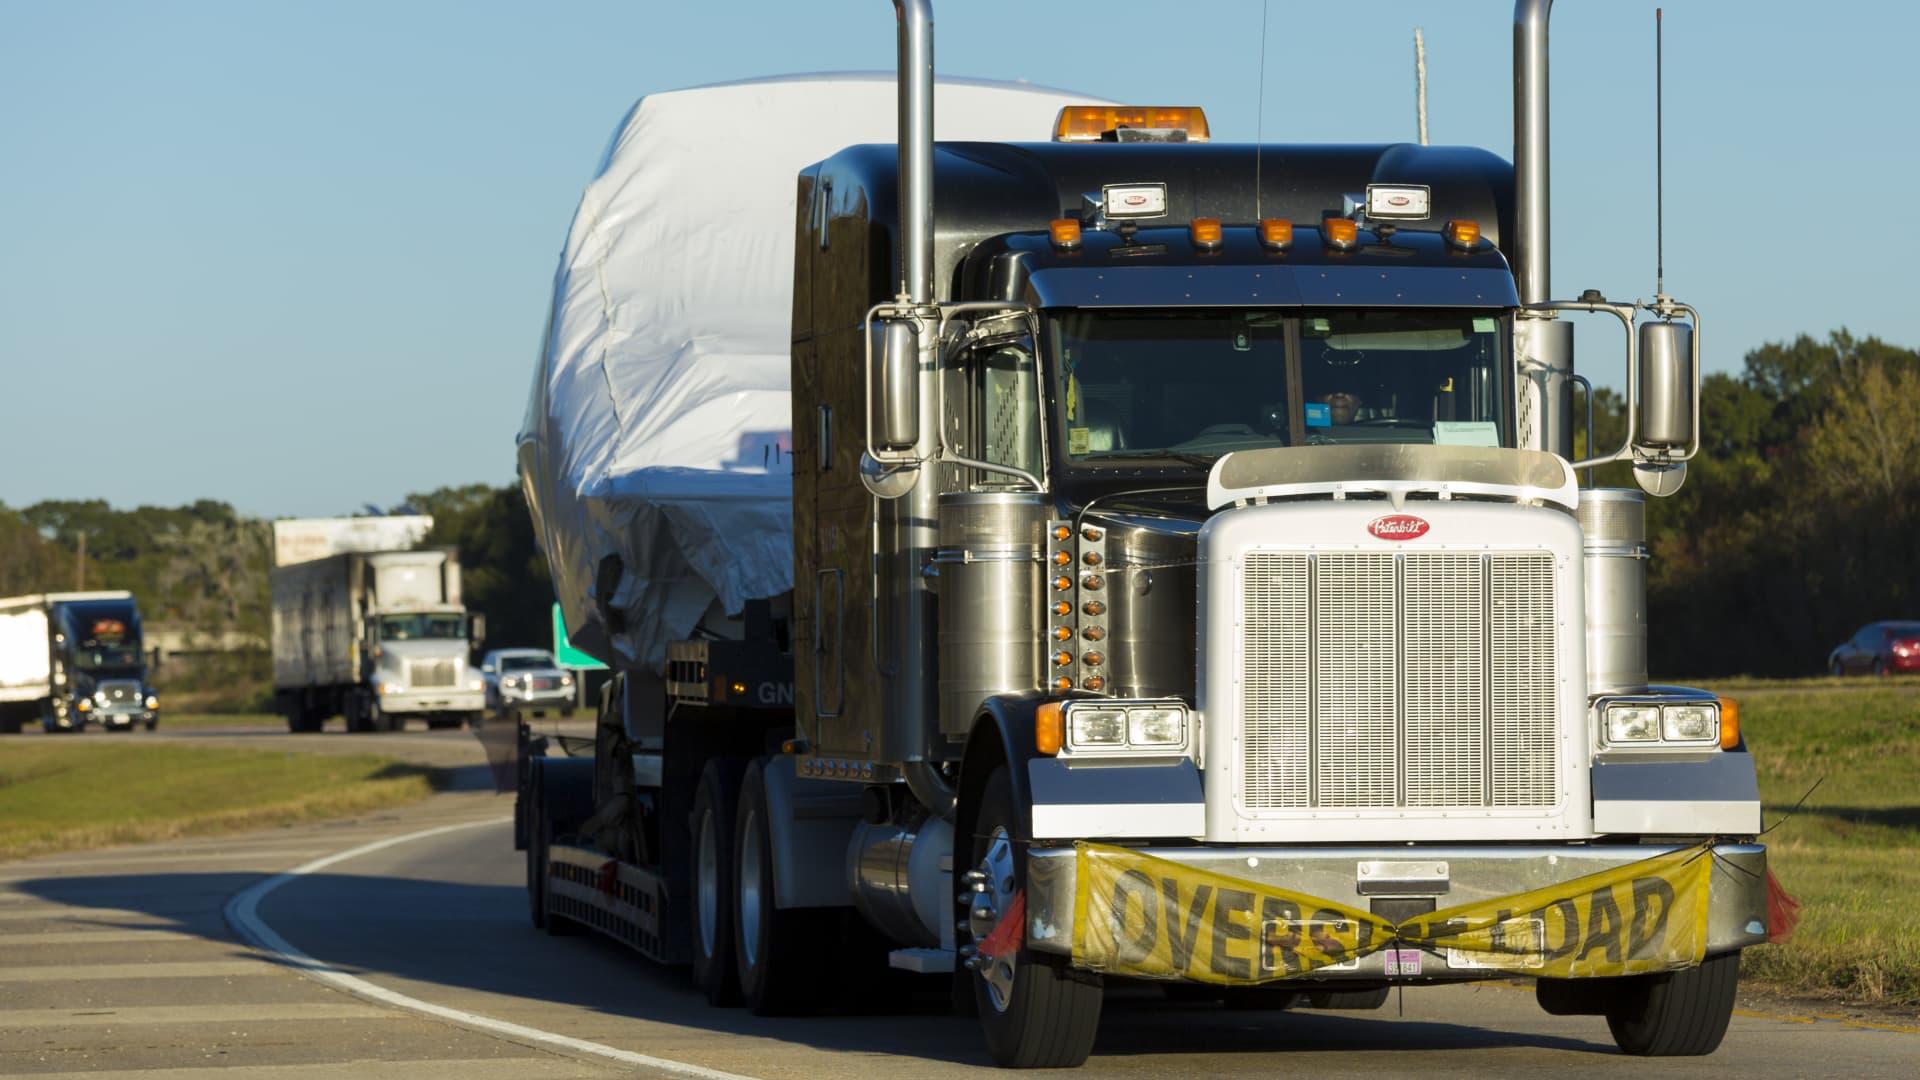 American Peterbilt truck on trucking route Interstate 10 in Louisiana.